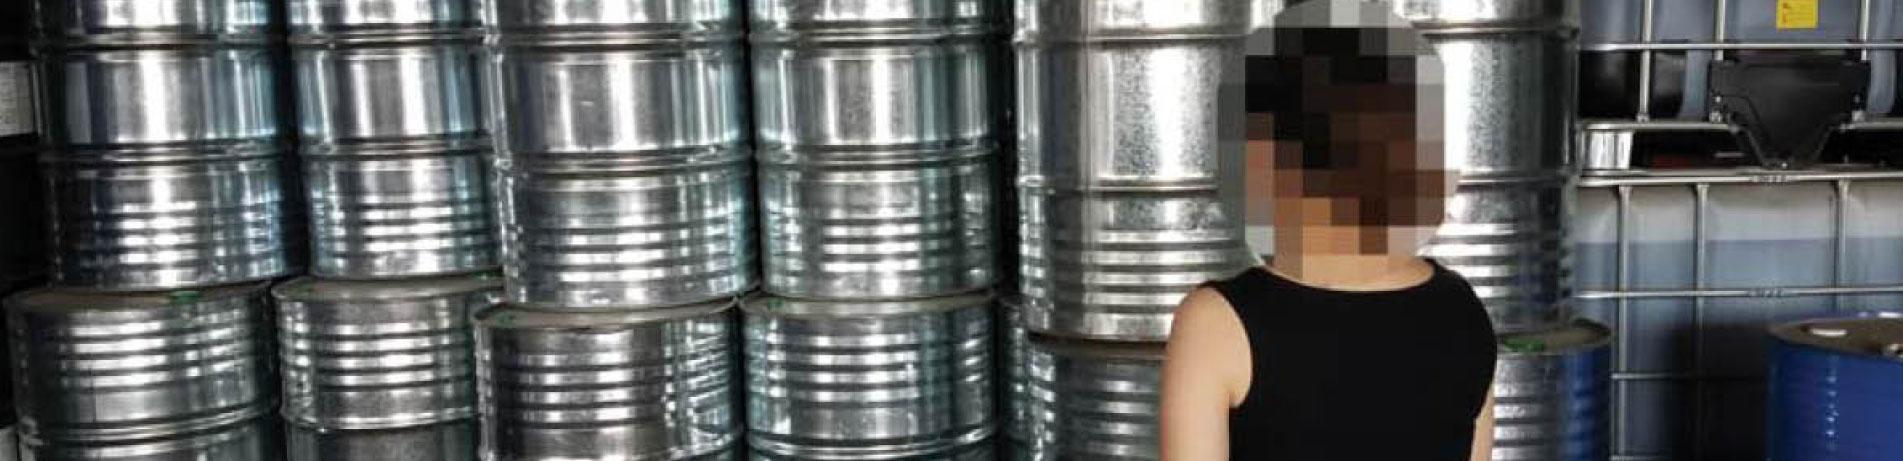 Barrels containing CFCs, China